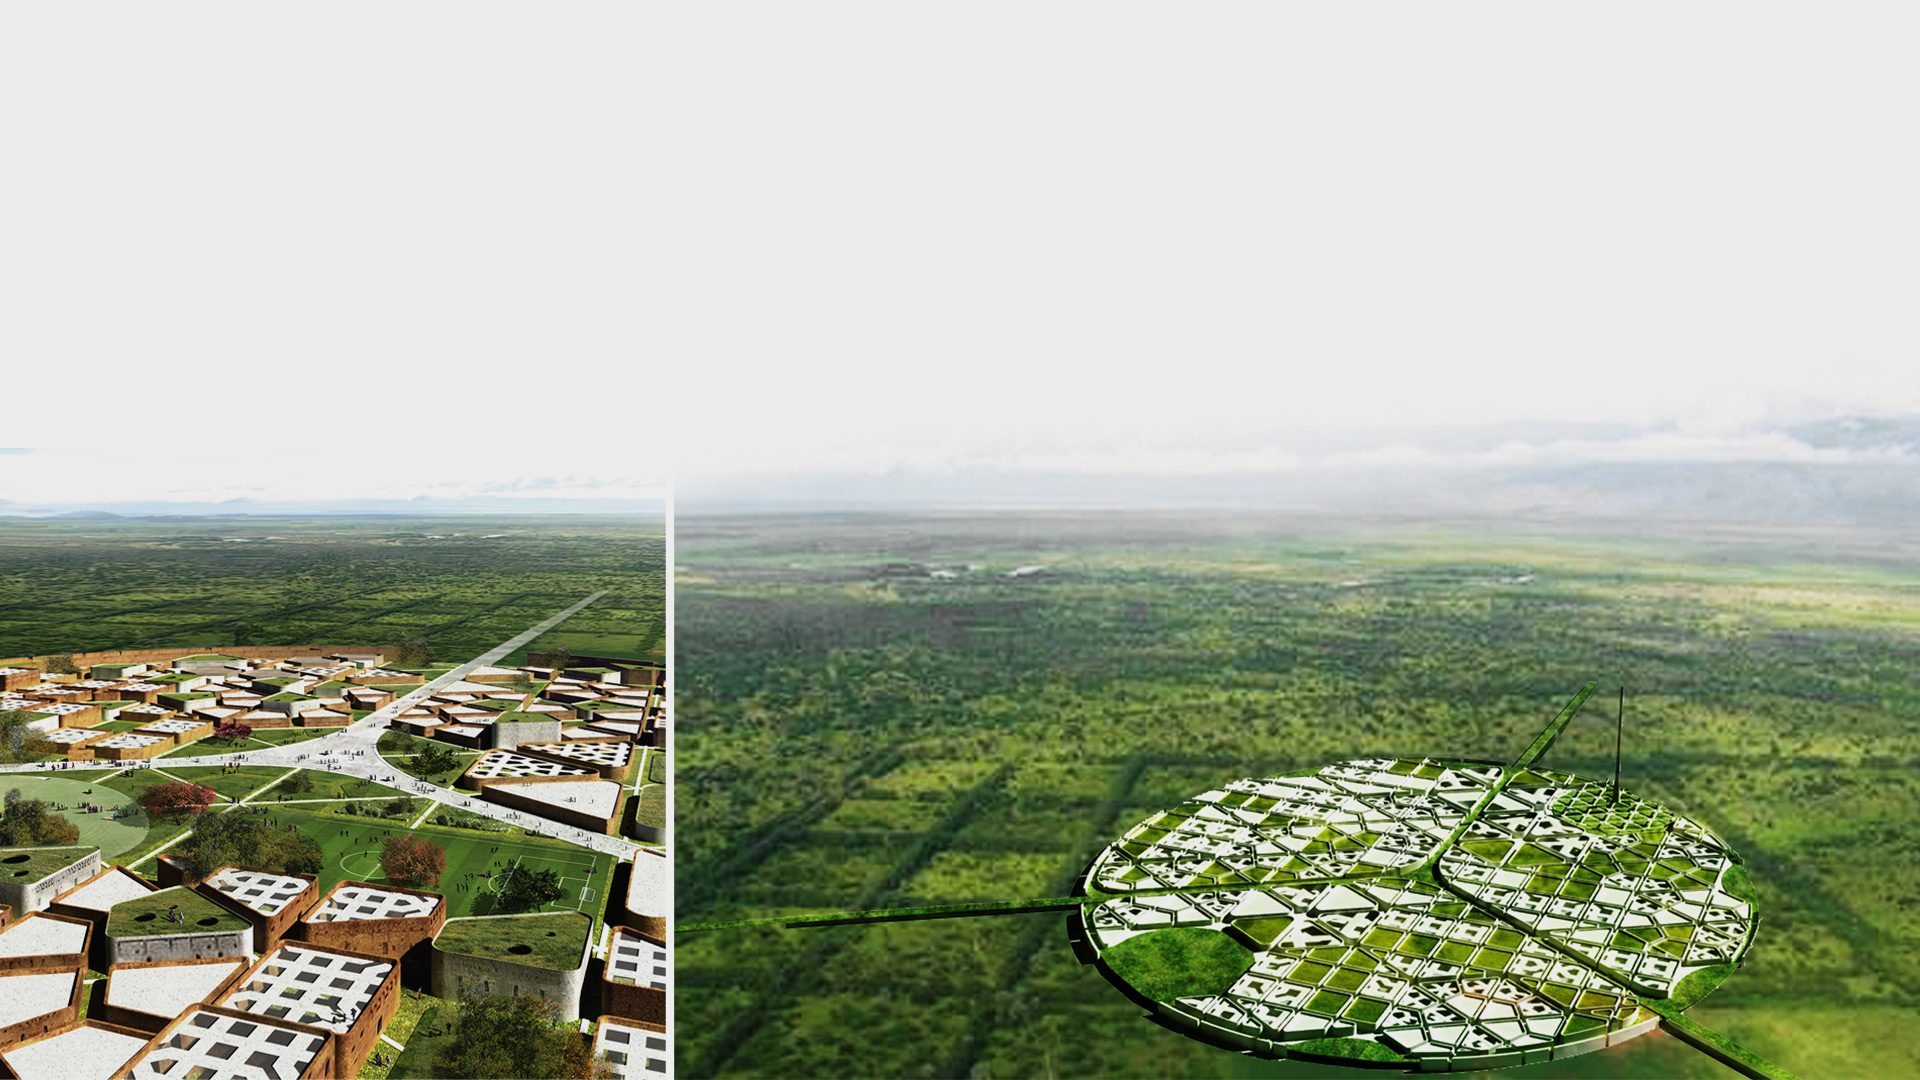 03_ONE-Village_-Aerial-View